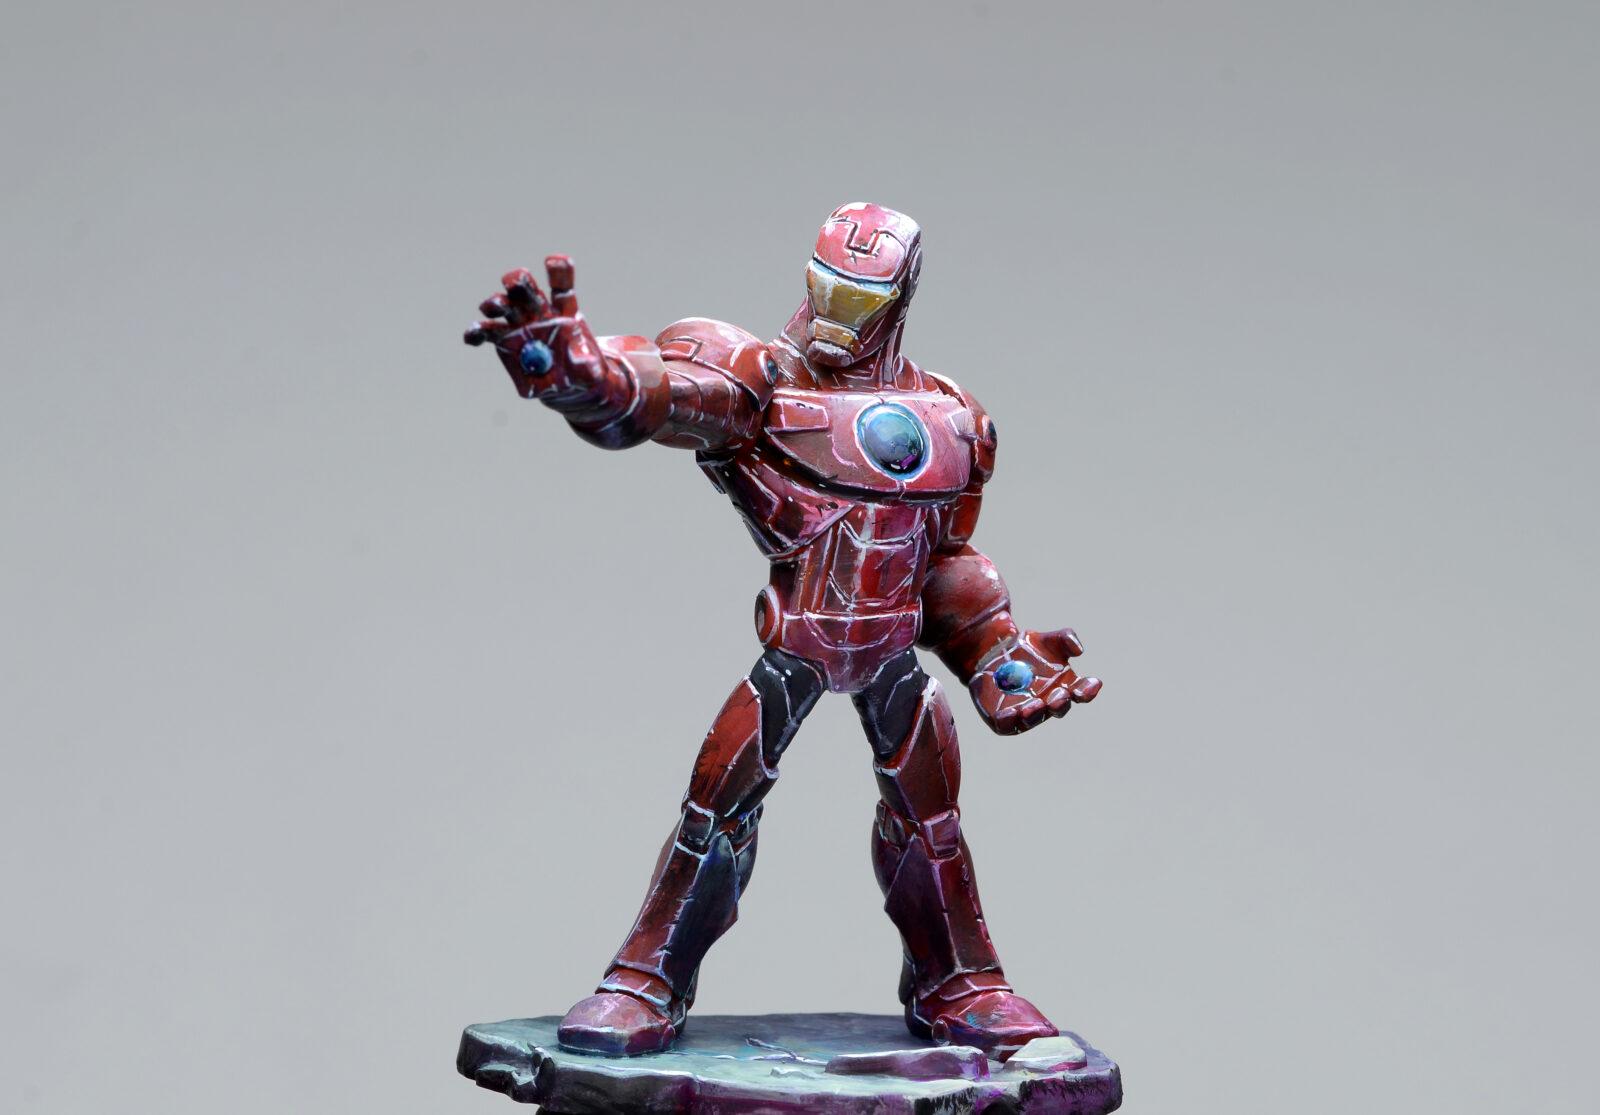 Ironman05